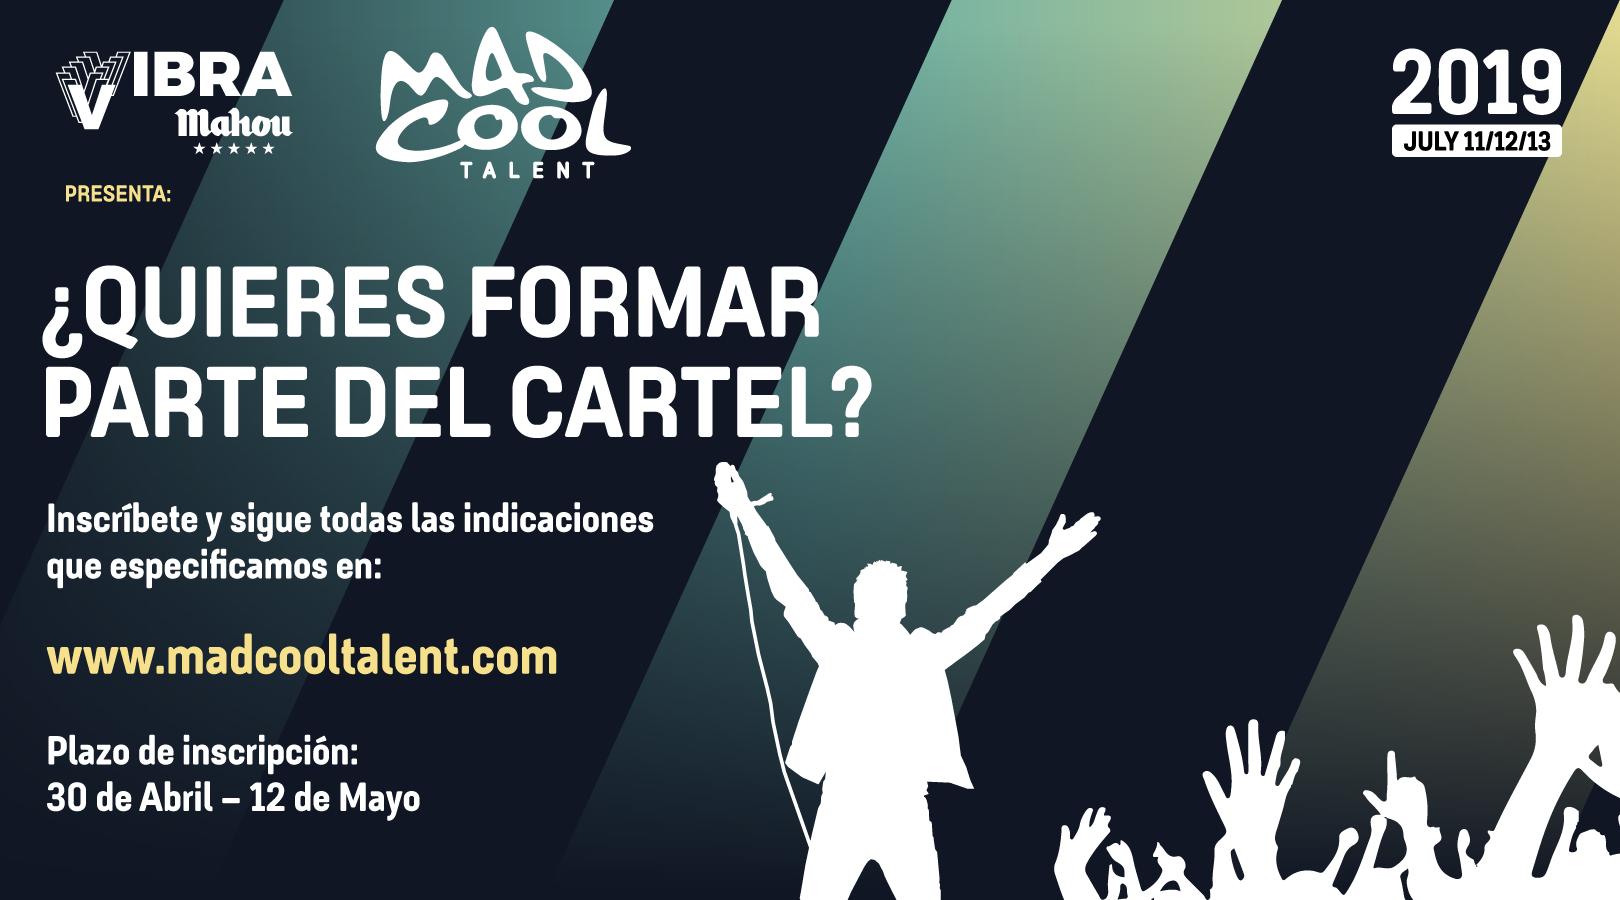 madcool talent 2019